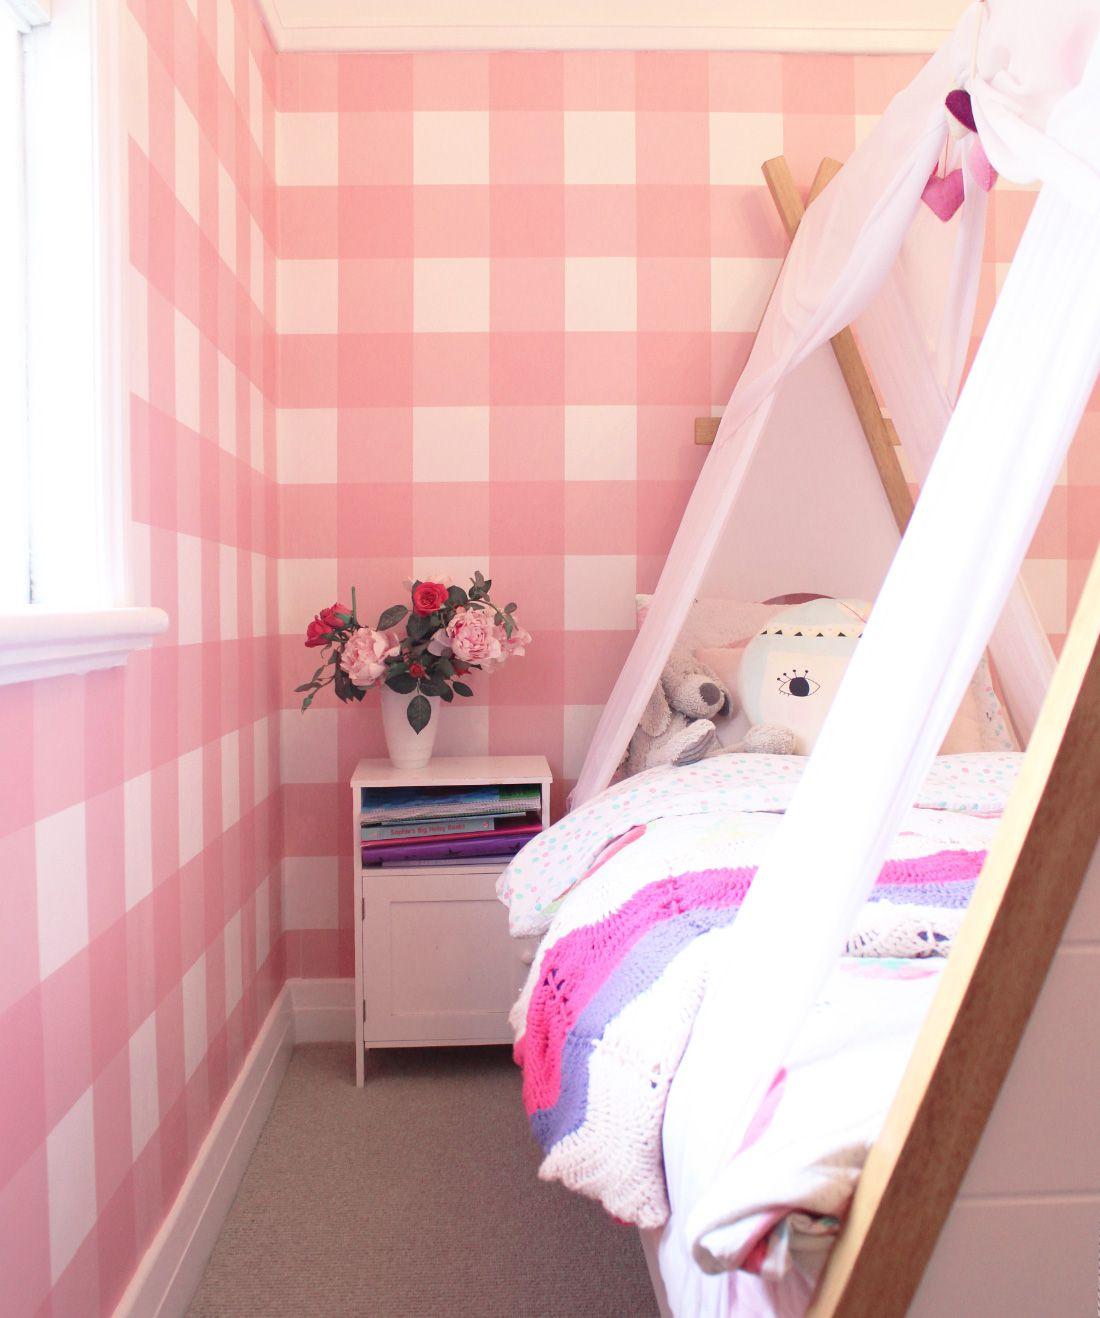 Buffalo Check Wallpaper • Little Kids Bedroom • Pink Plaid Wallpaper